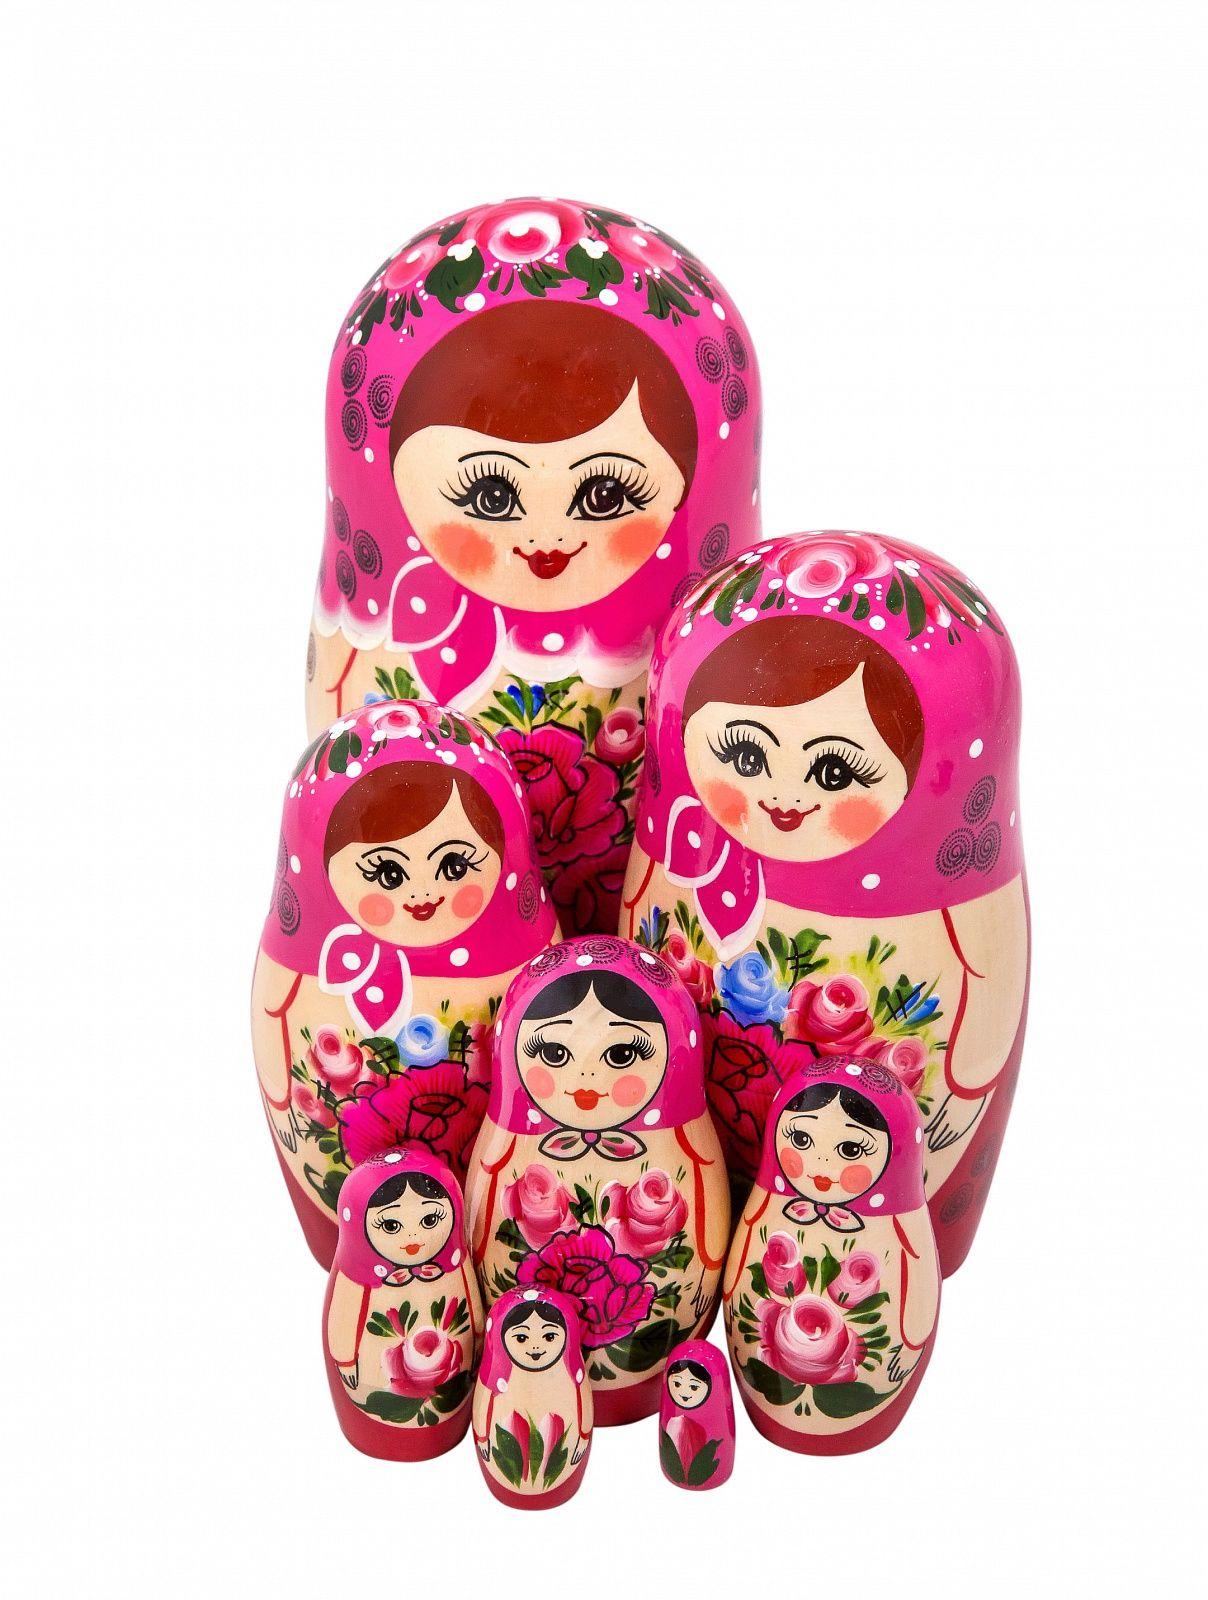 Khokhloma painting / Matryoshka non-traditional 8 dolls